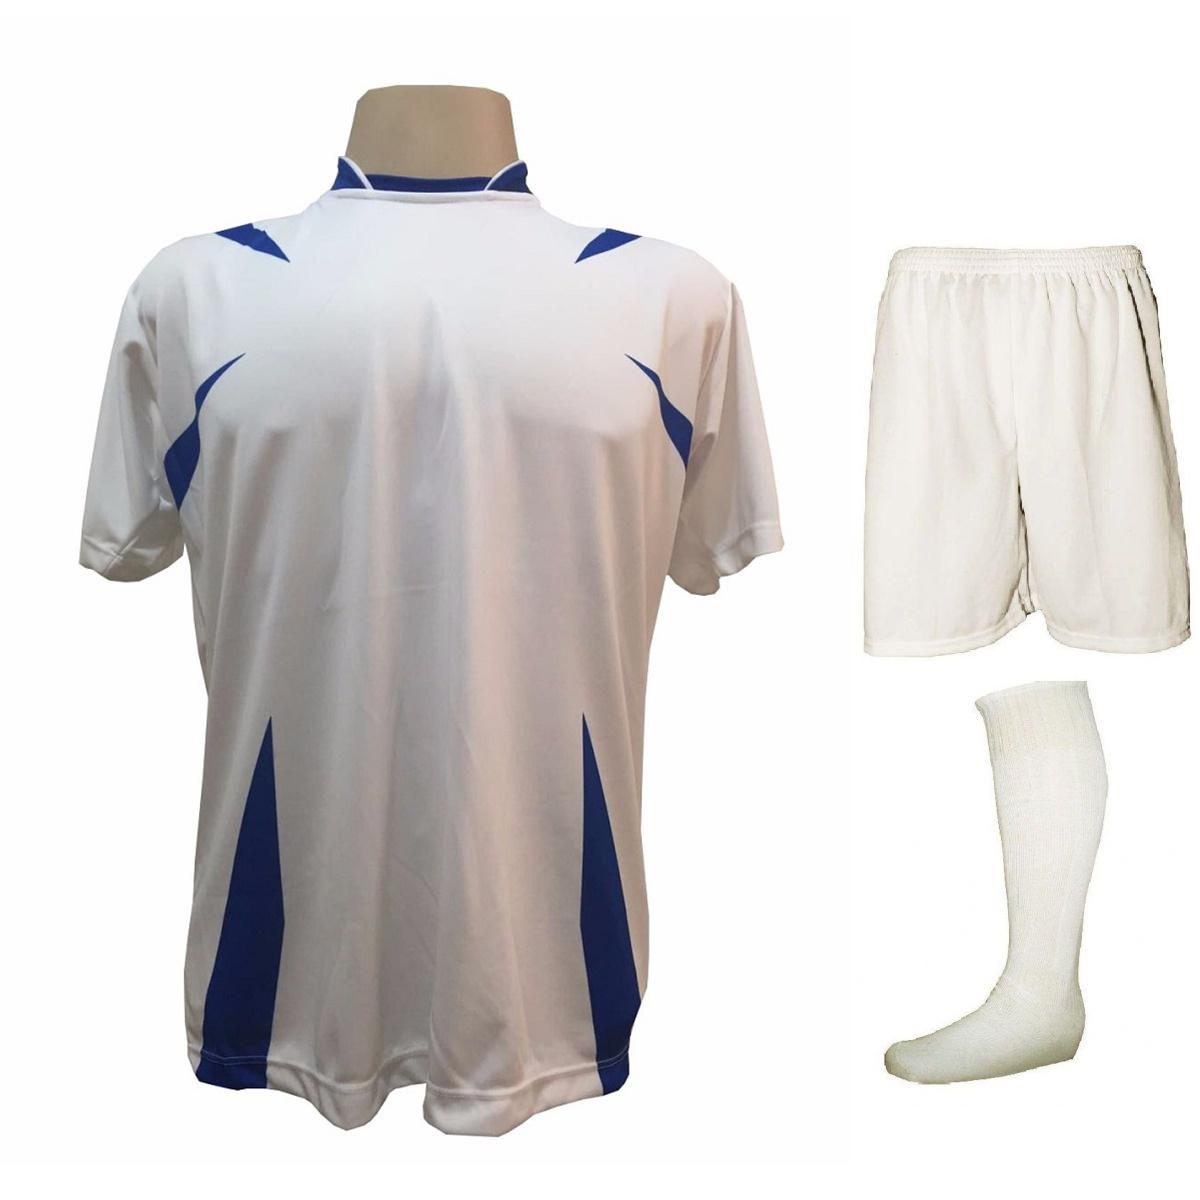 9eeb3eb3c8 Uniforme Esportivo com 14 camisas modelo Palermo Branco Royal + 14 calções  modelo Madrid Branco ...